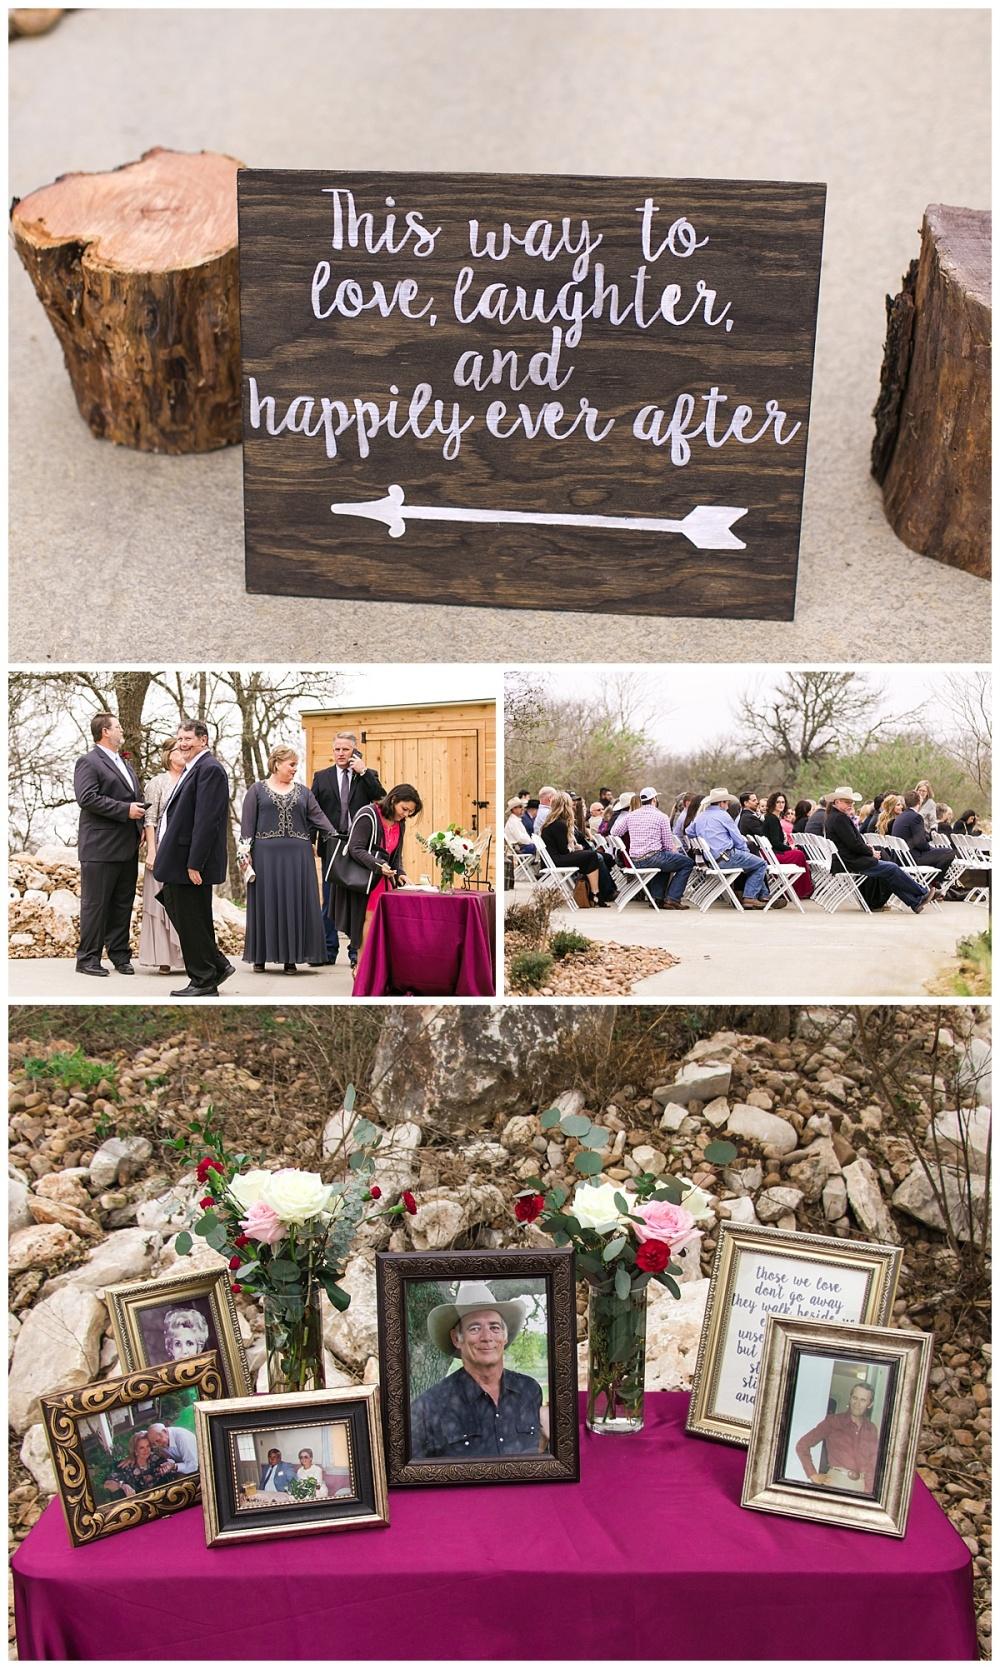 Carly-Barton-Photography-Geronimo-Oaks-Wedding-Venue-Texas-Hill-Country-Ronnie-Sarah_0089.jpg